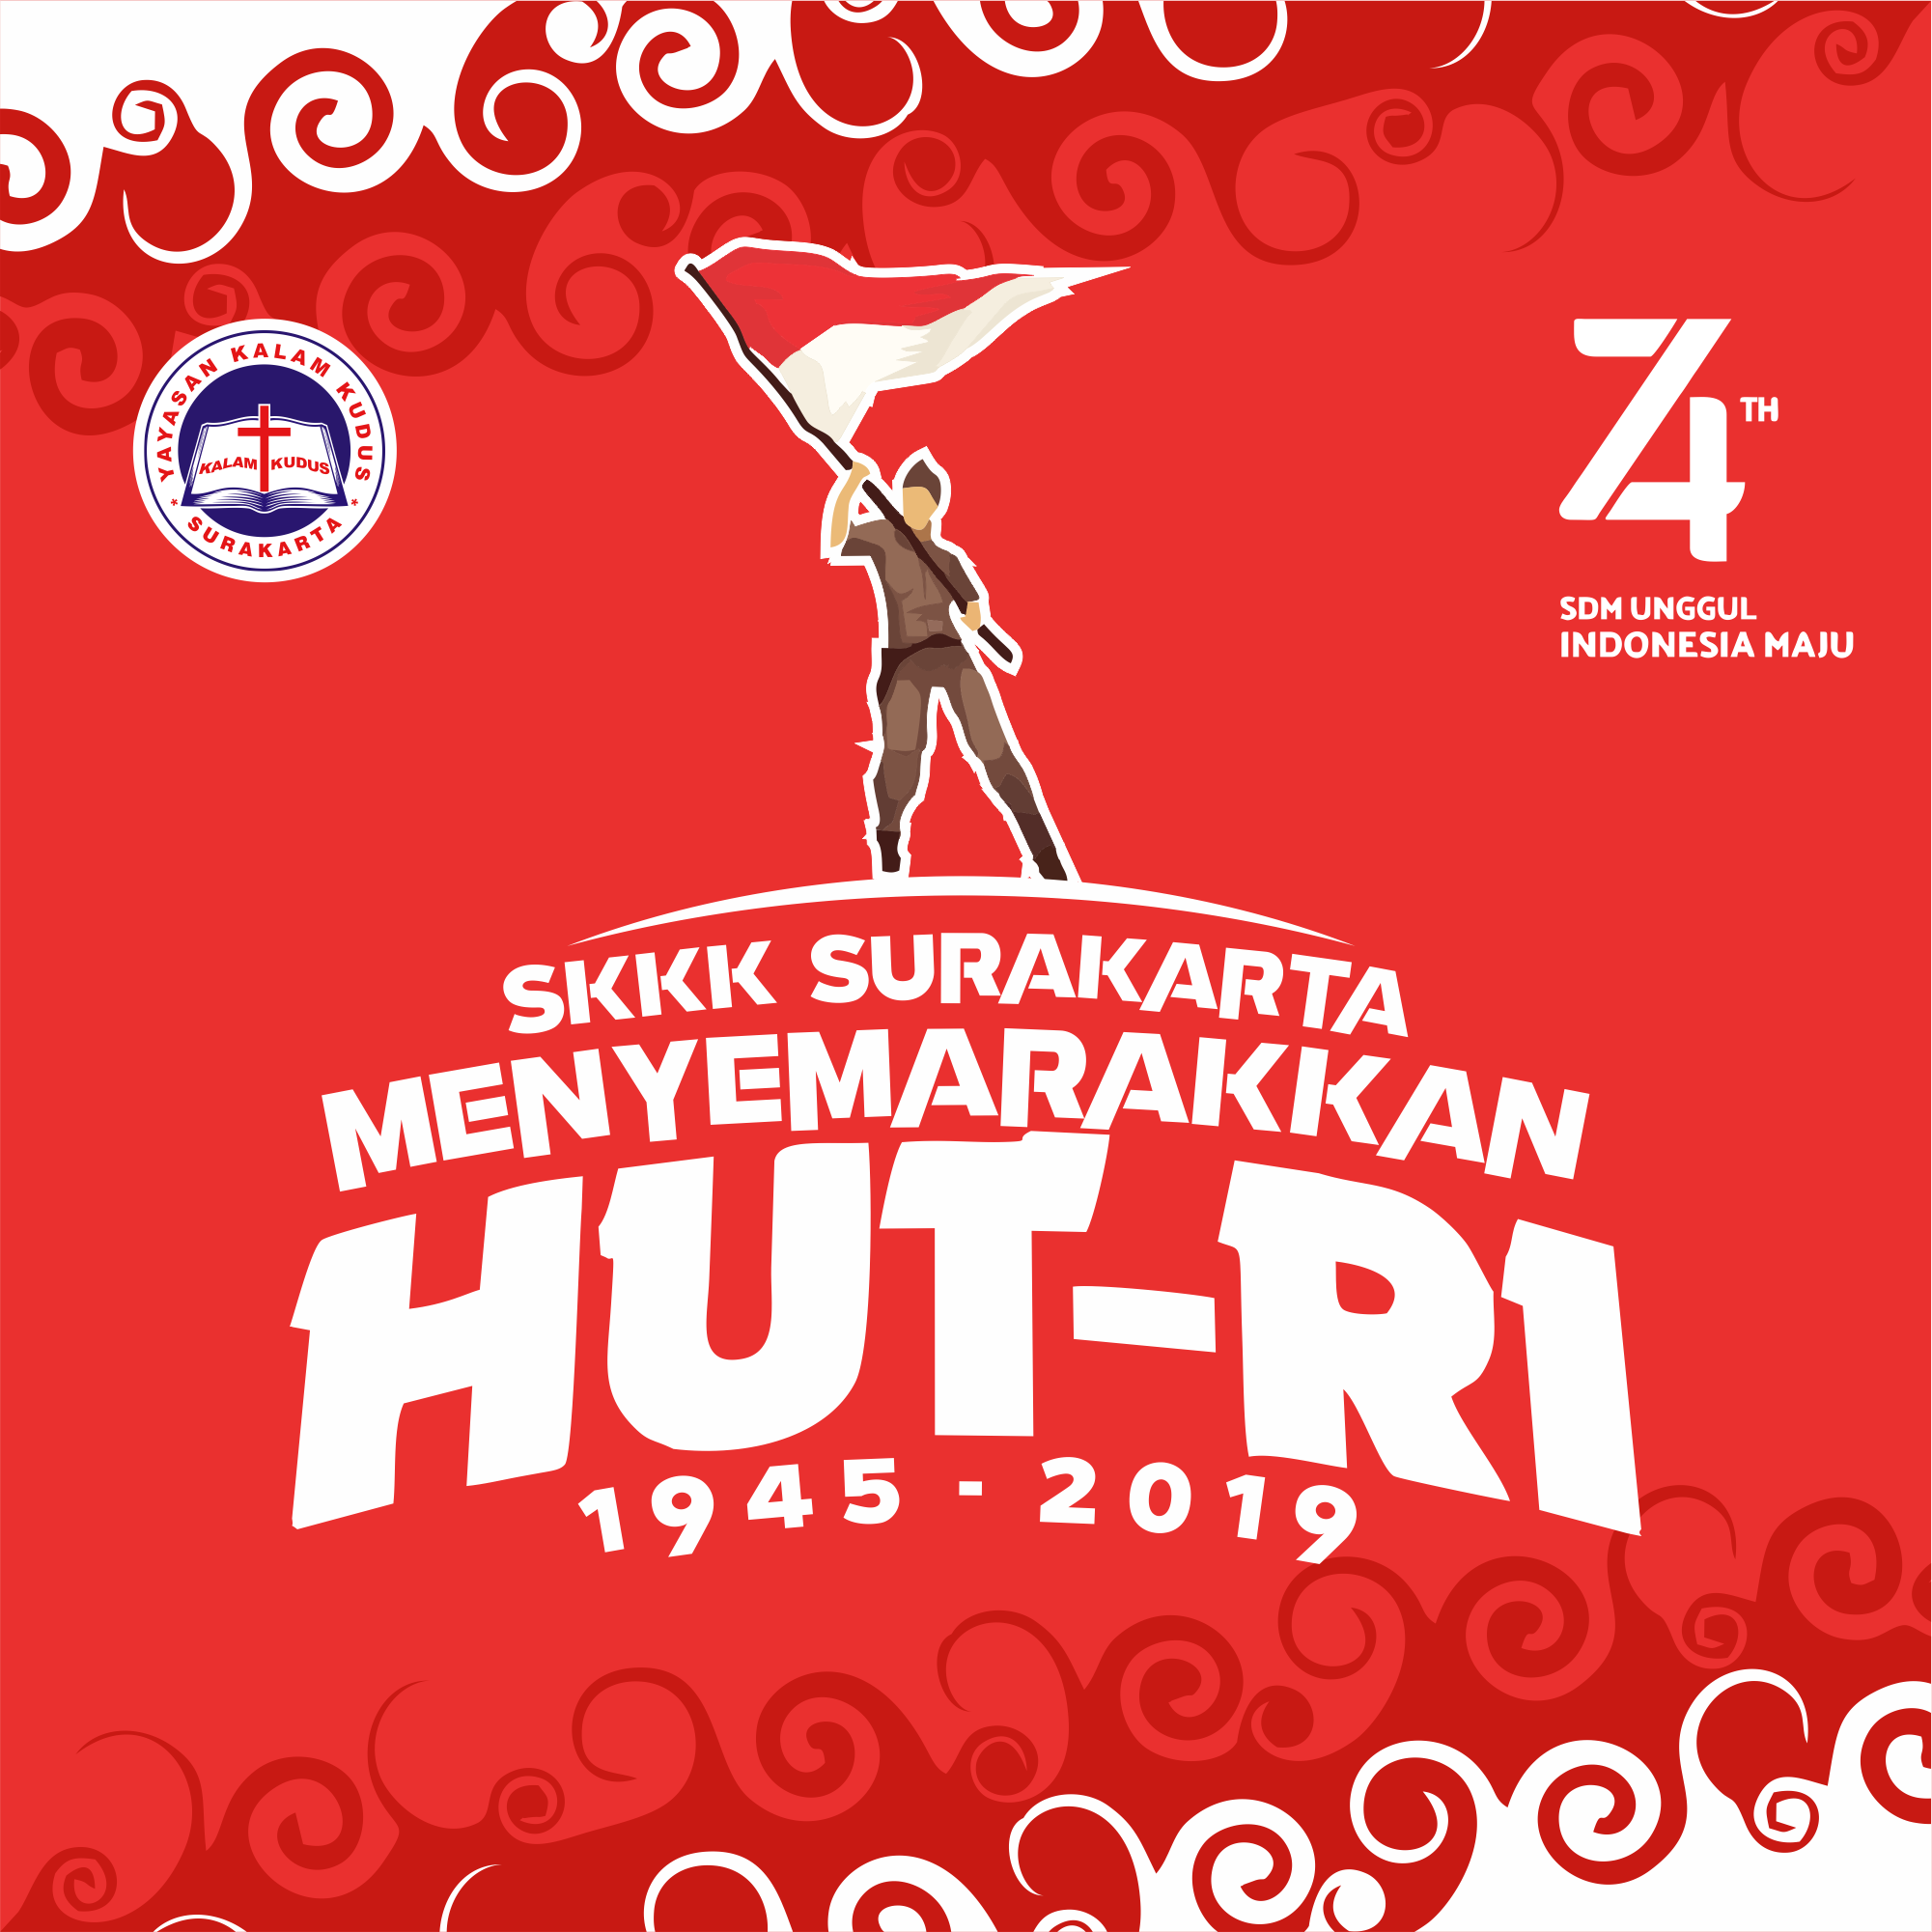 Dirgahayu Republik Indonesia 17 Agustus 2019